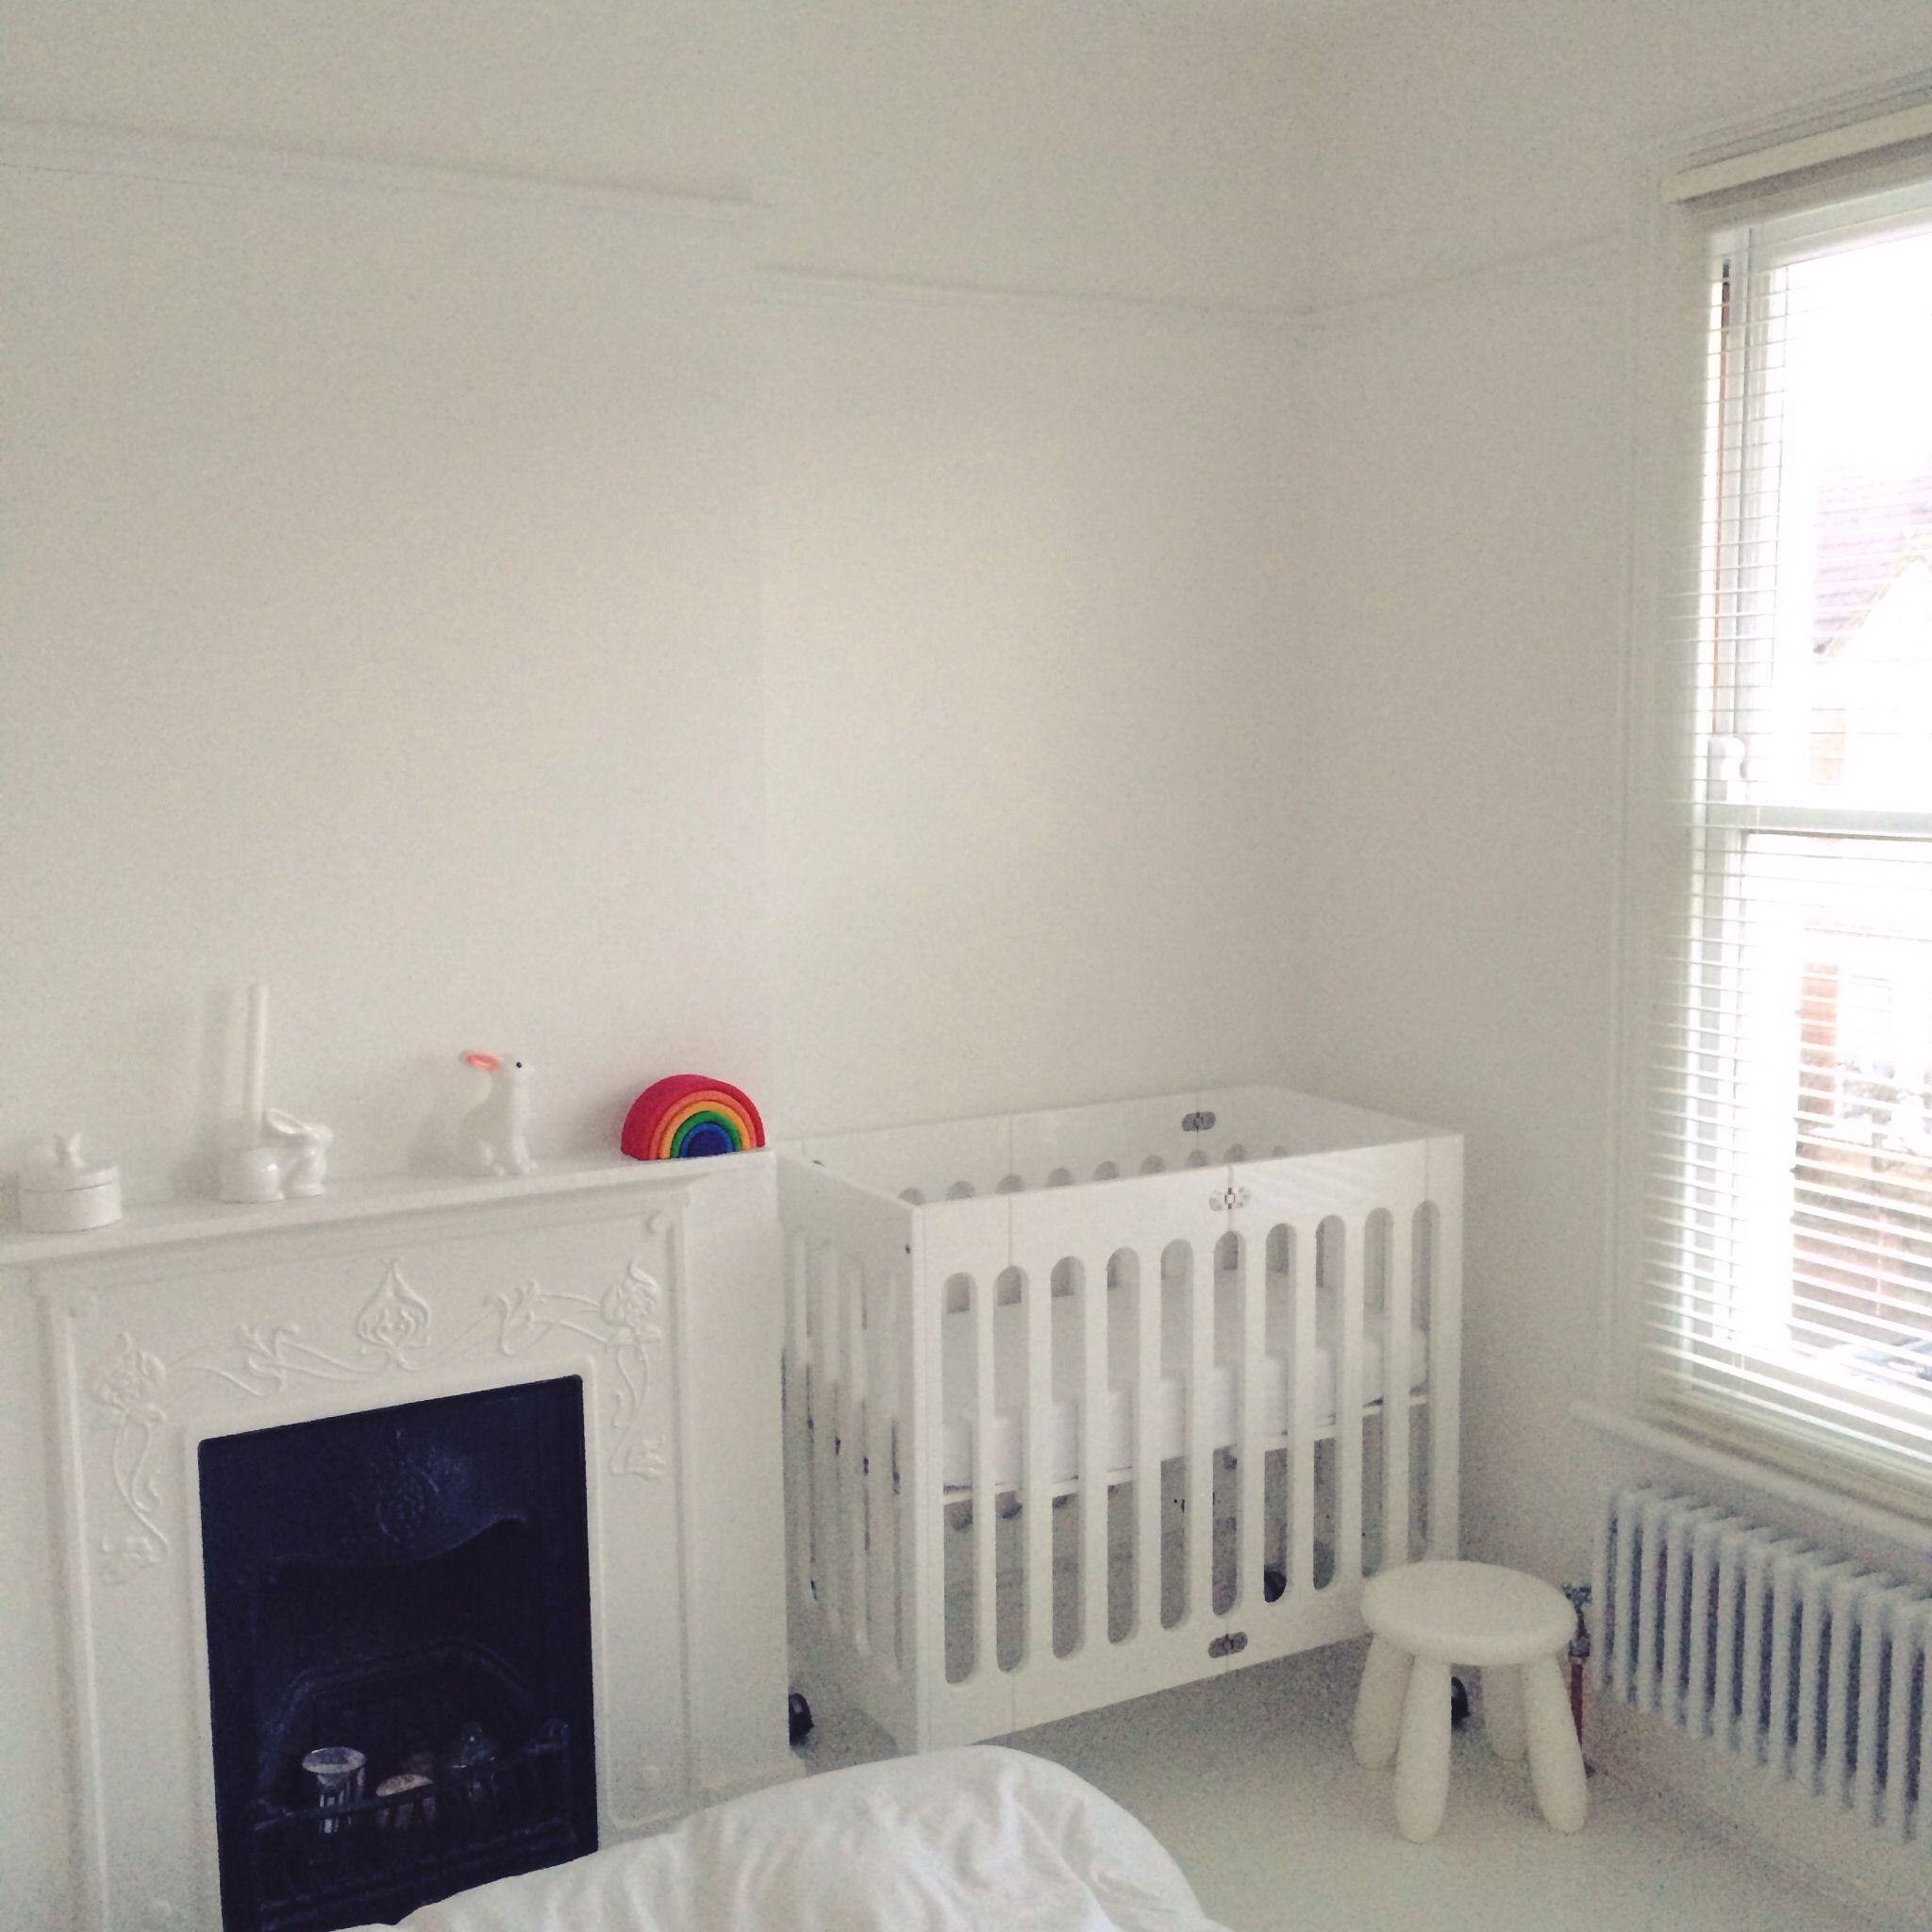 bargains in baby kalani y davinci crib cribs white mini best